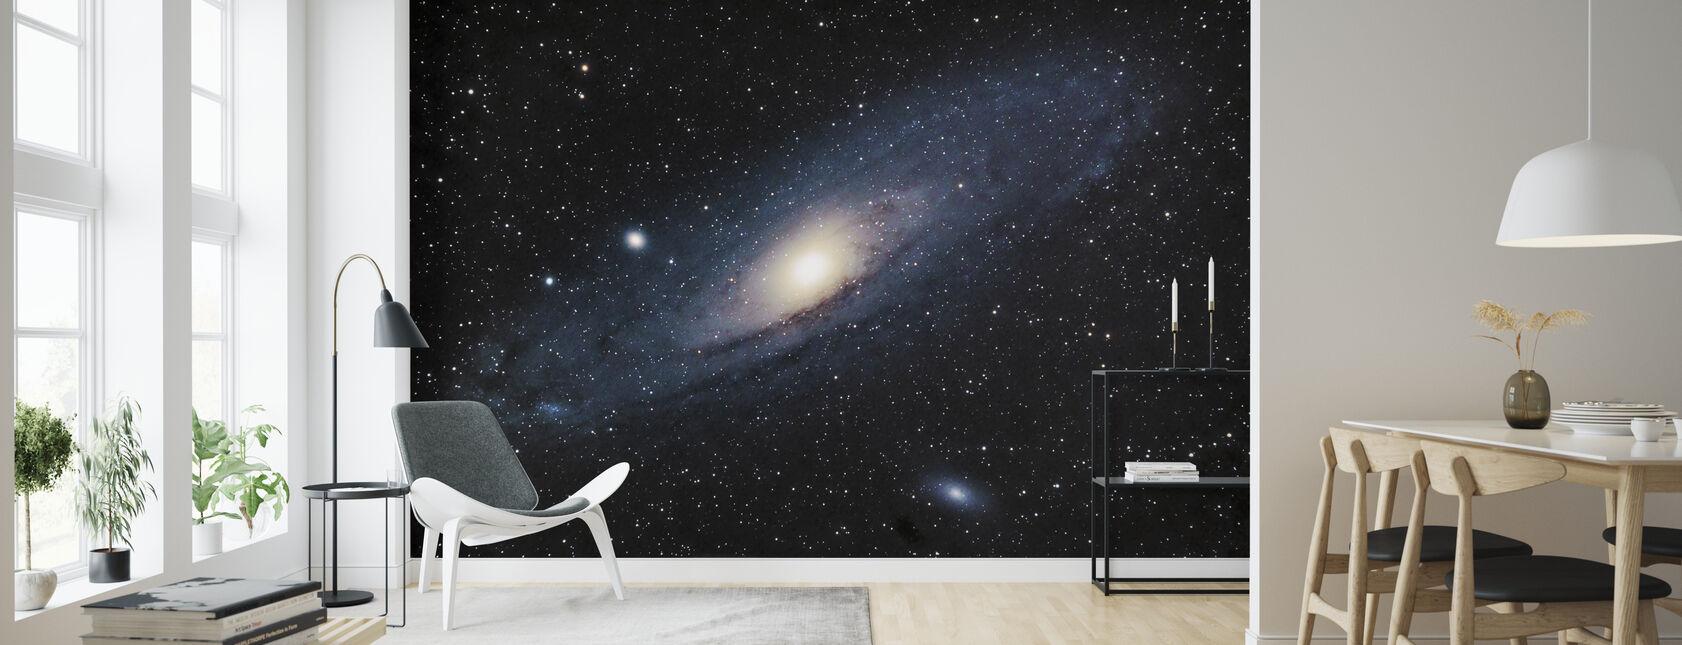 Andromeda Galaxy - Tapetti - Olohuone